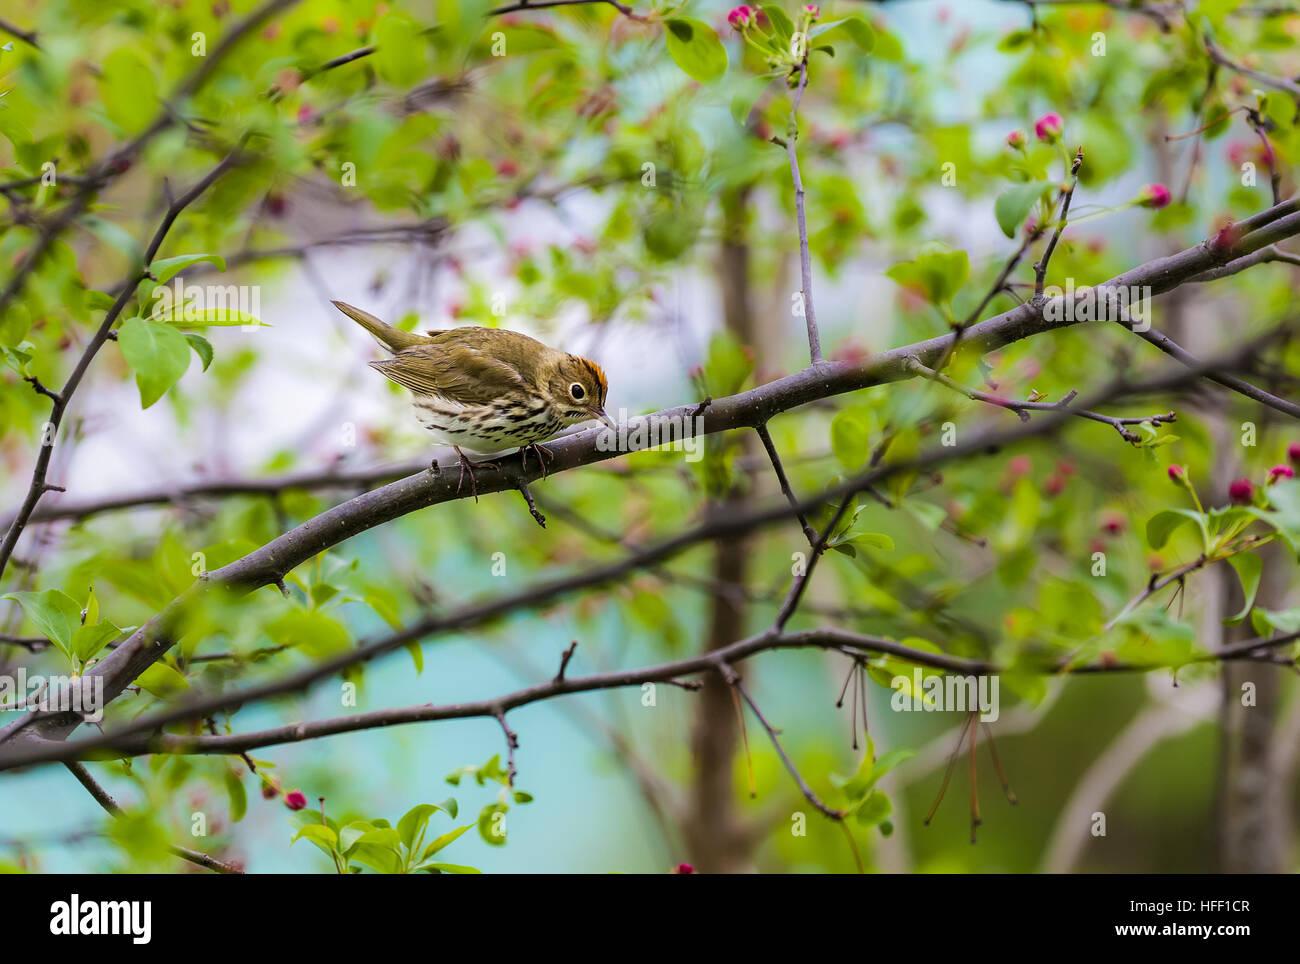 The Ovenbird, Seiurus aurocapilla, is a migratory songbird in the warbler family. Stock Photo